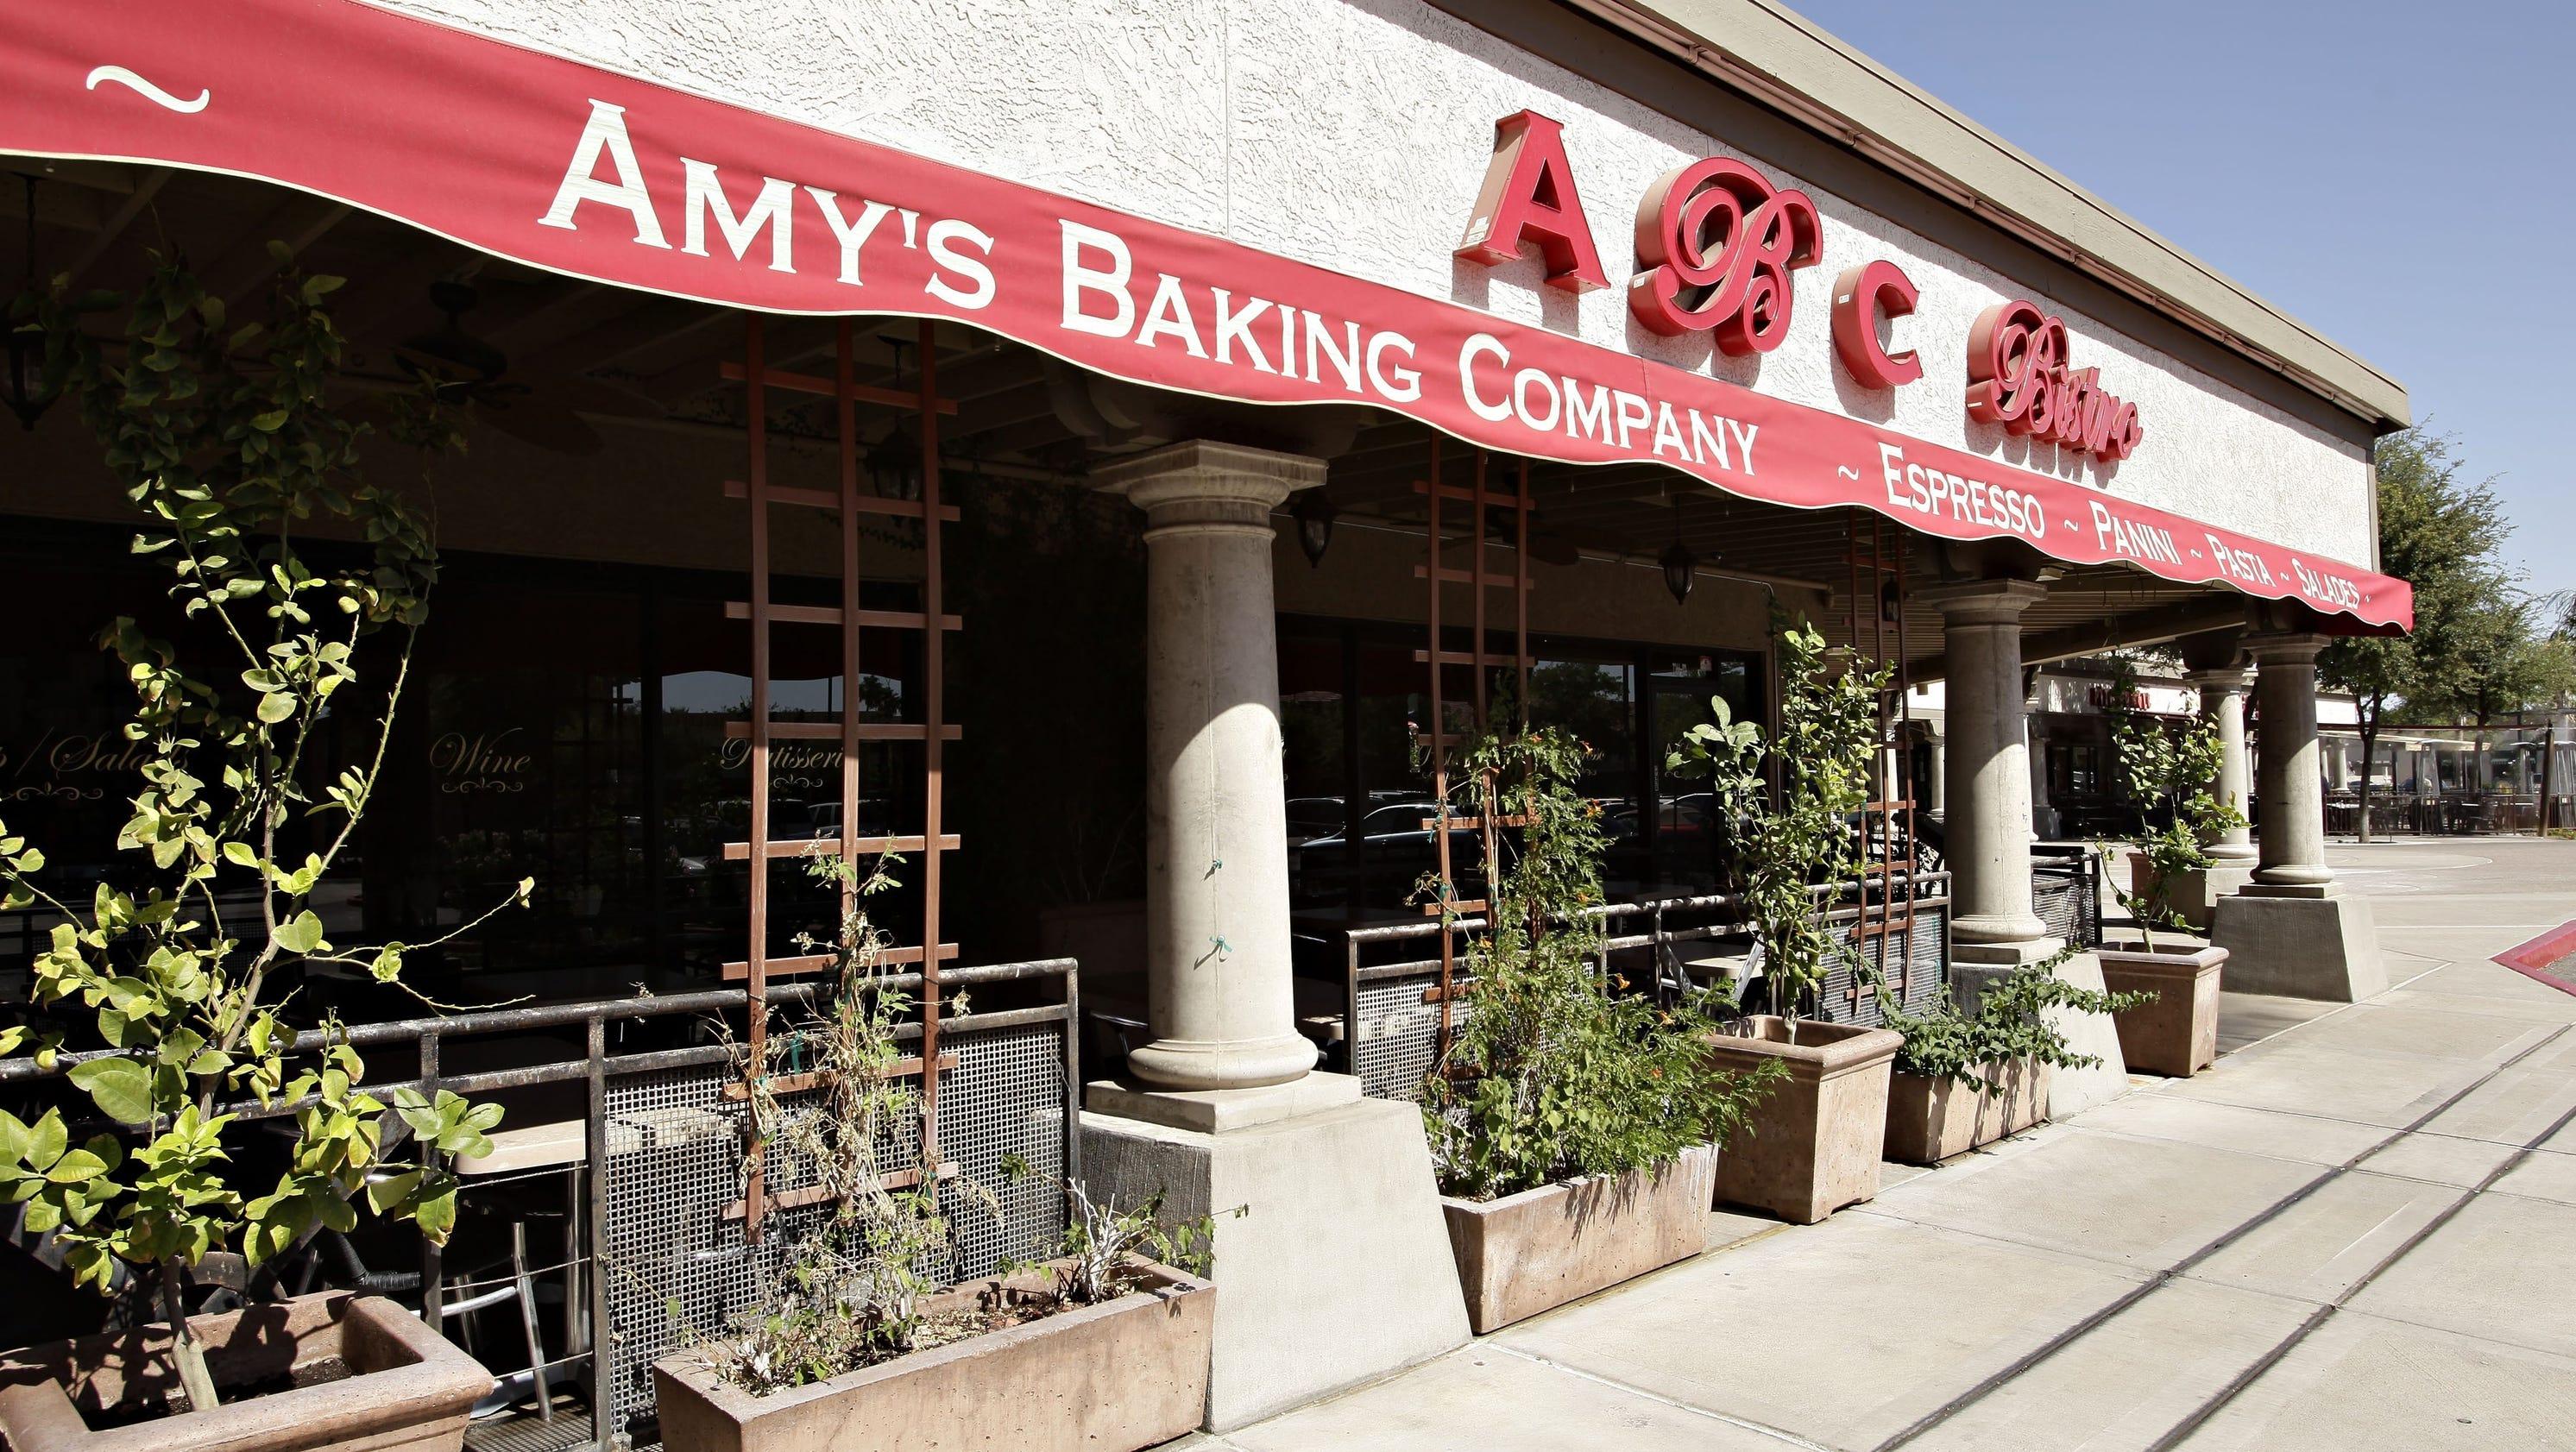 4/11: Amy's Baking Co. returns on 'Kitchen Nightmares'